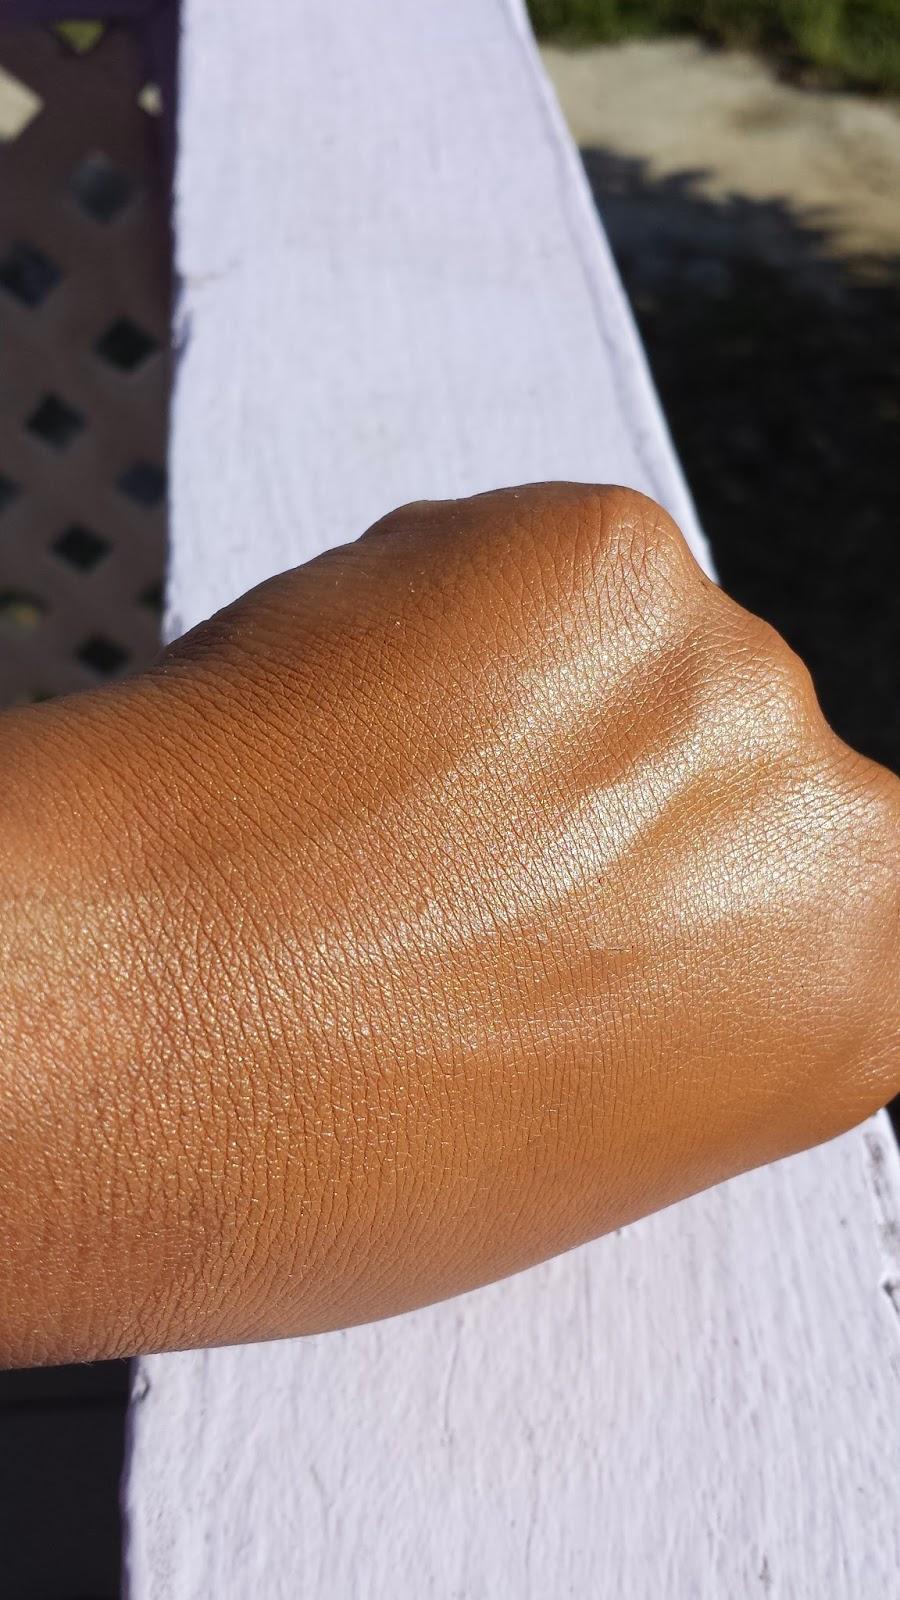 Estee Lauder Double Wear Light swatch - www.modenmakeup.com